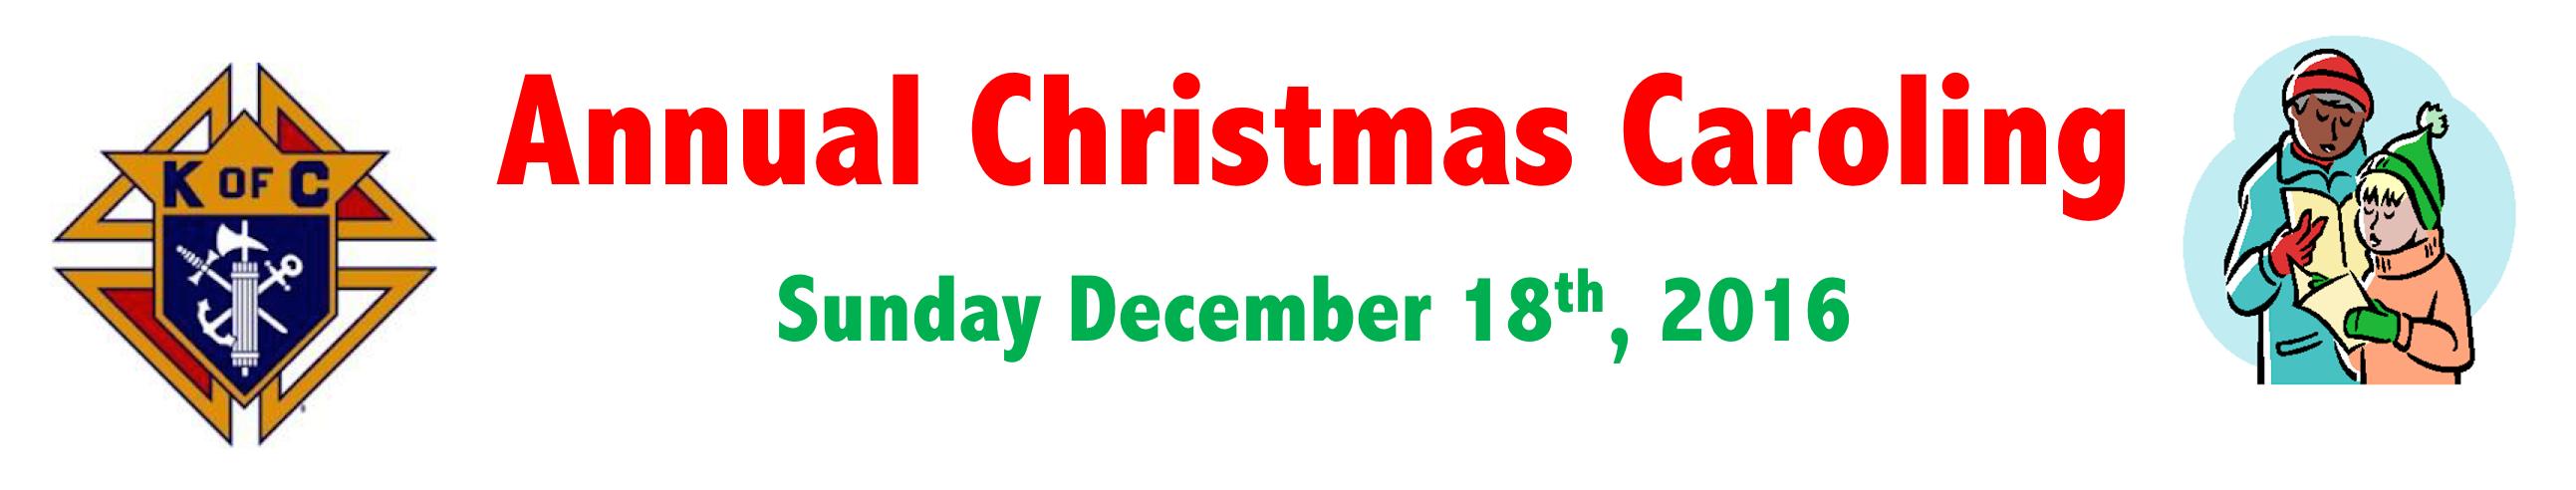 Christmas Caroling Banner